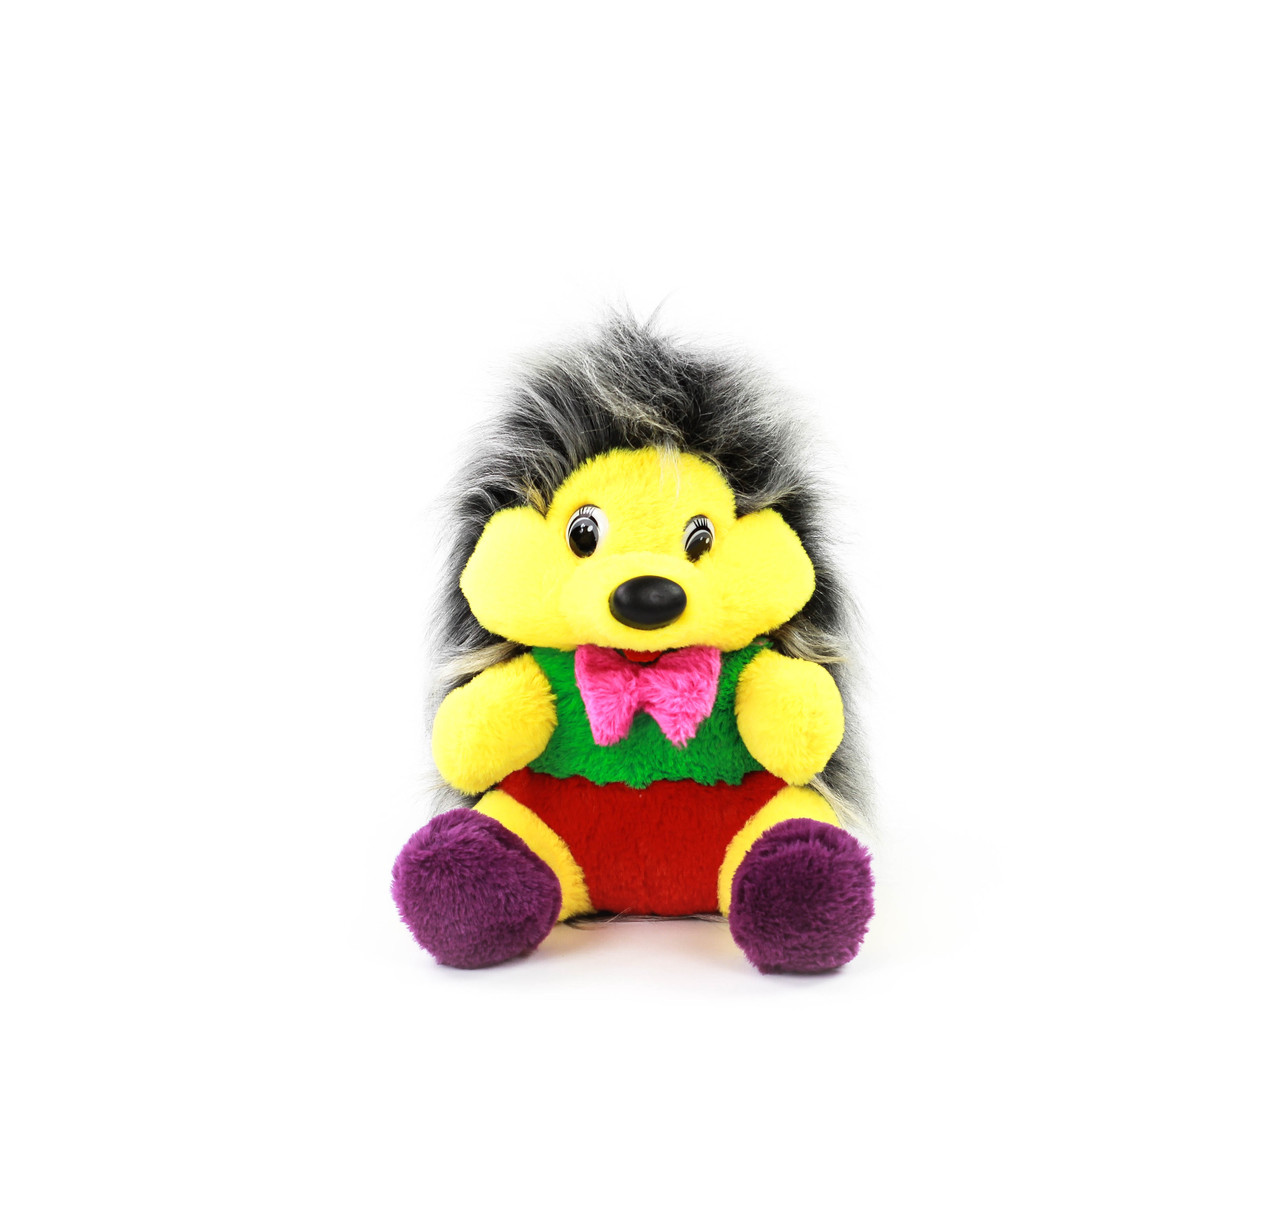 М'яка іграшка Їжачок Митя